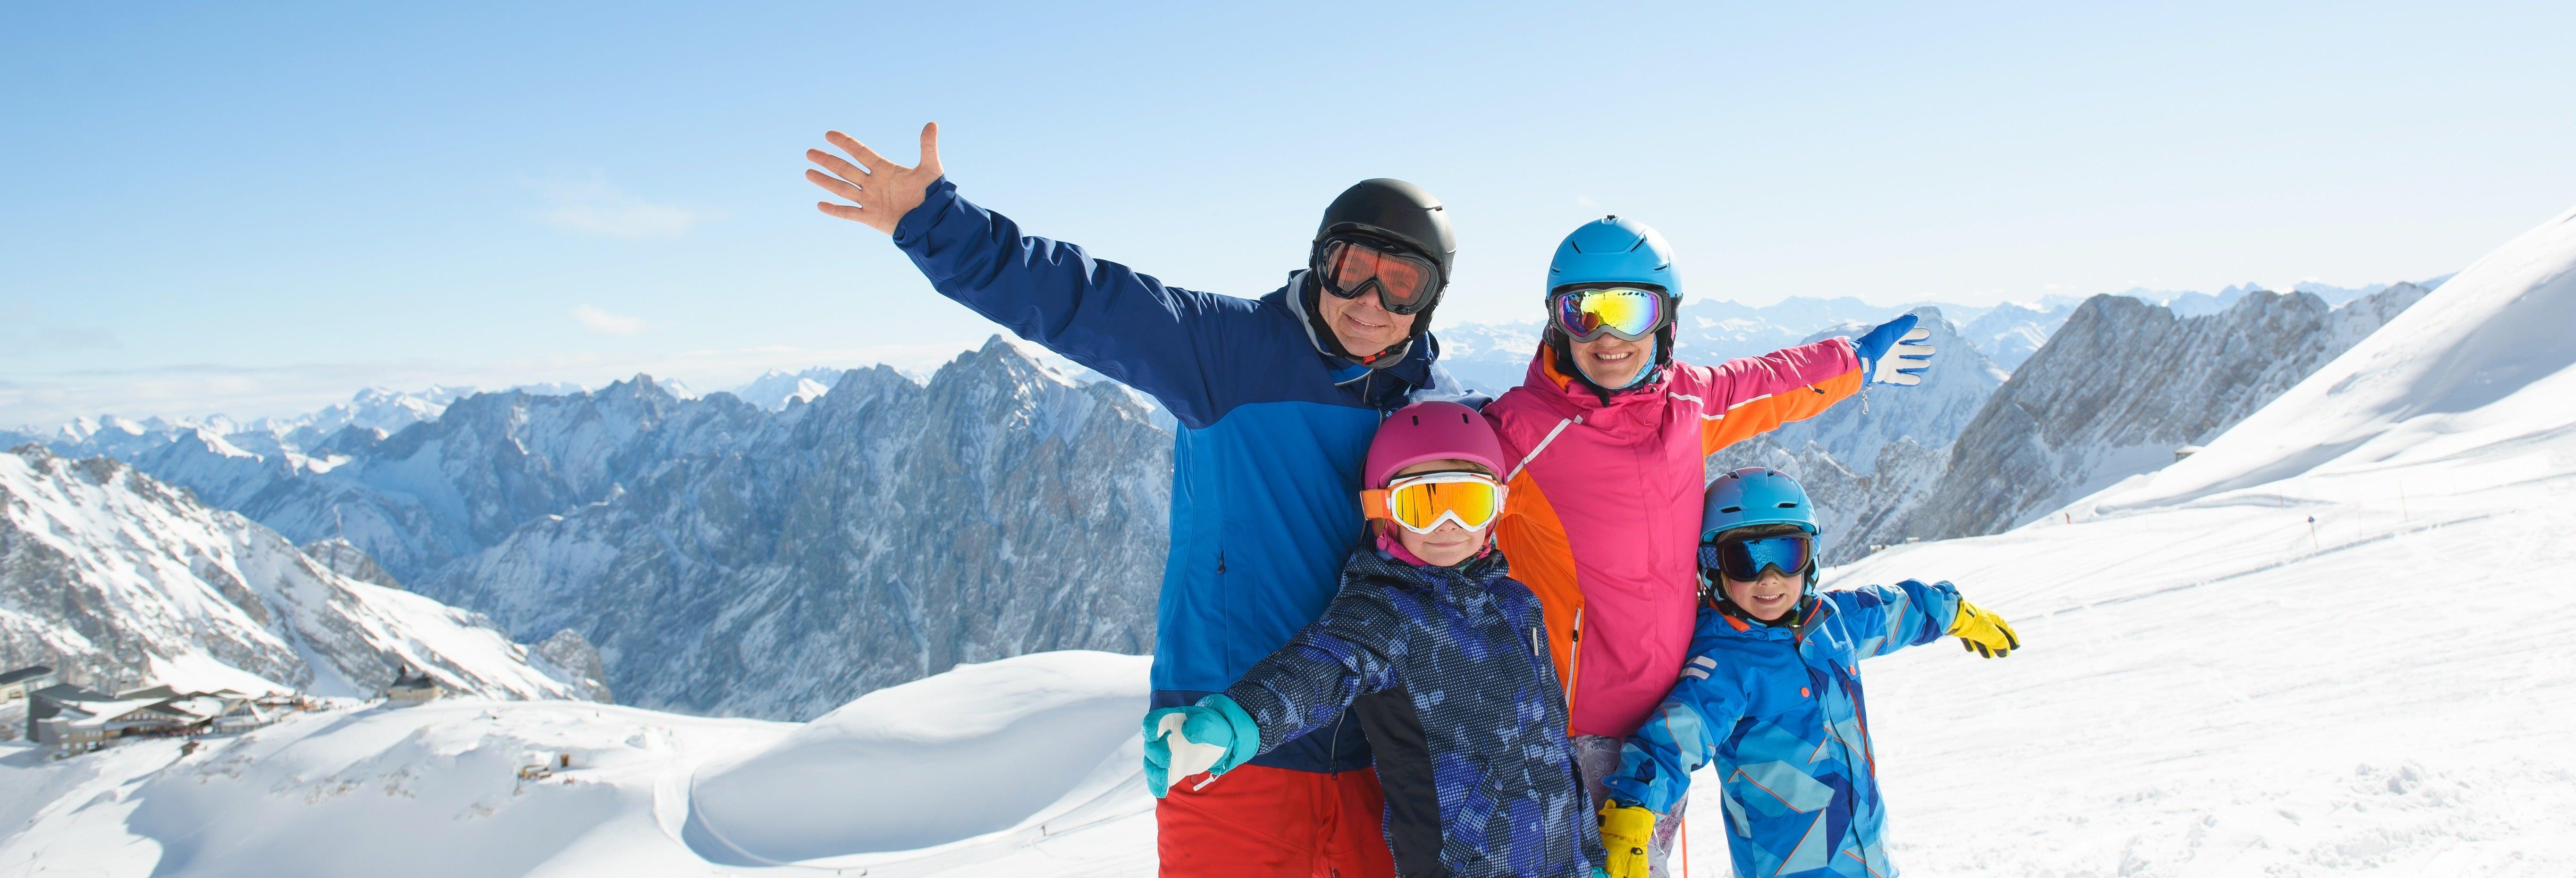 Ski or Snowboard Experience on Cerro Catedral